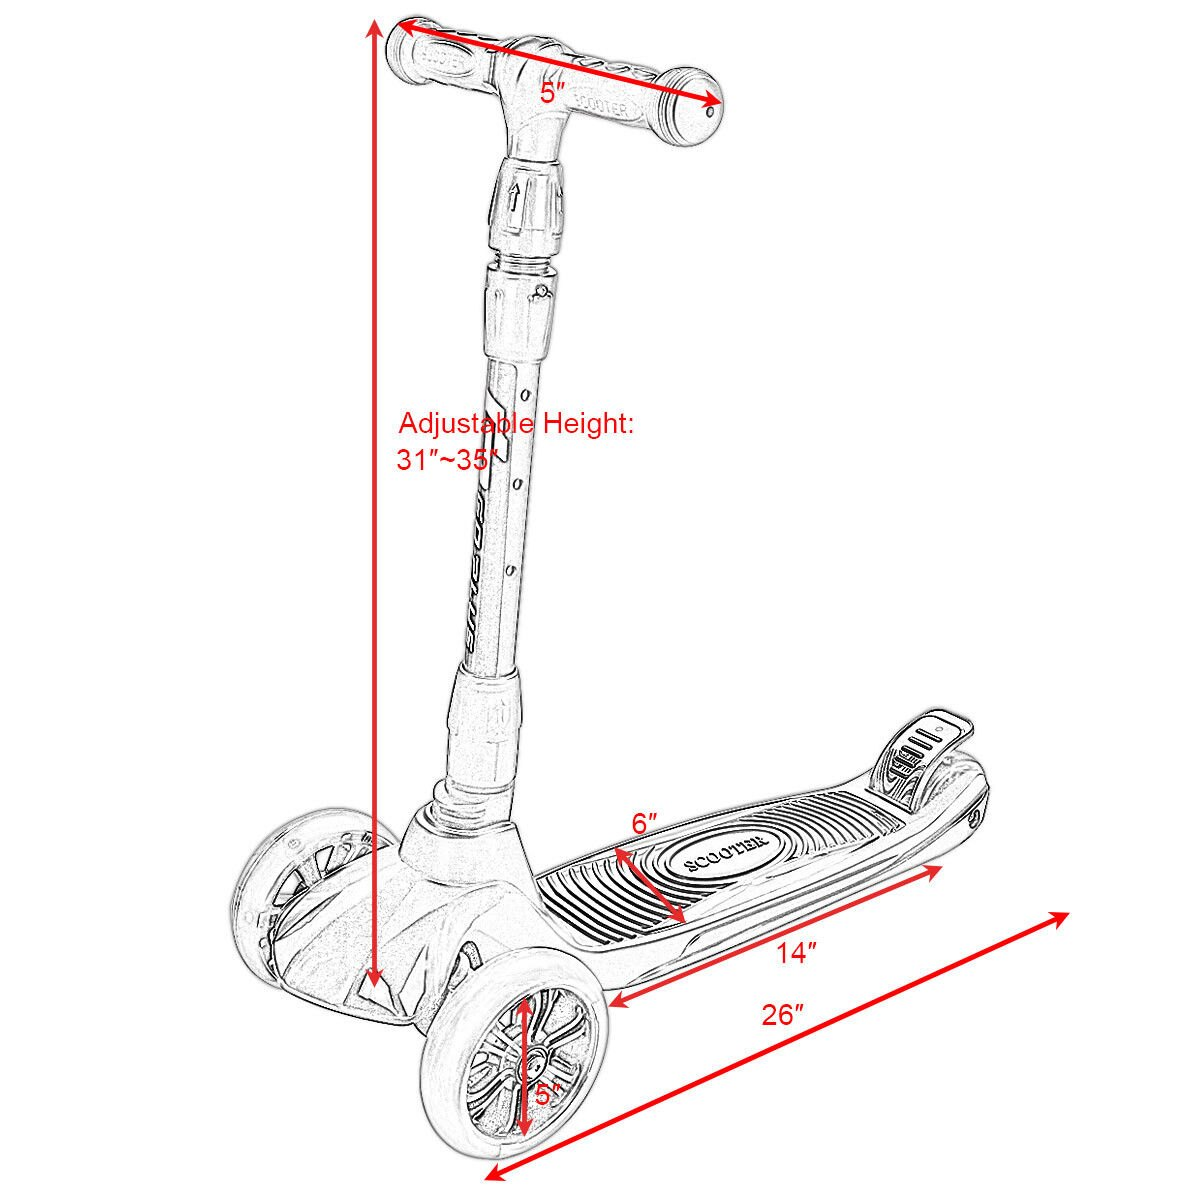 Costway Goplus Folding 3 Led Light Up Wheel Kids Kick Scooter Adjustable Height For Boys Girls